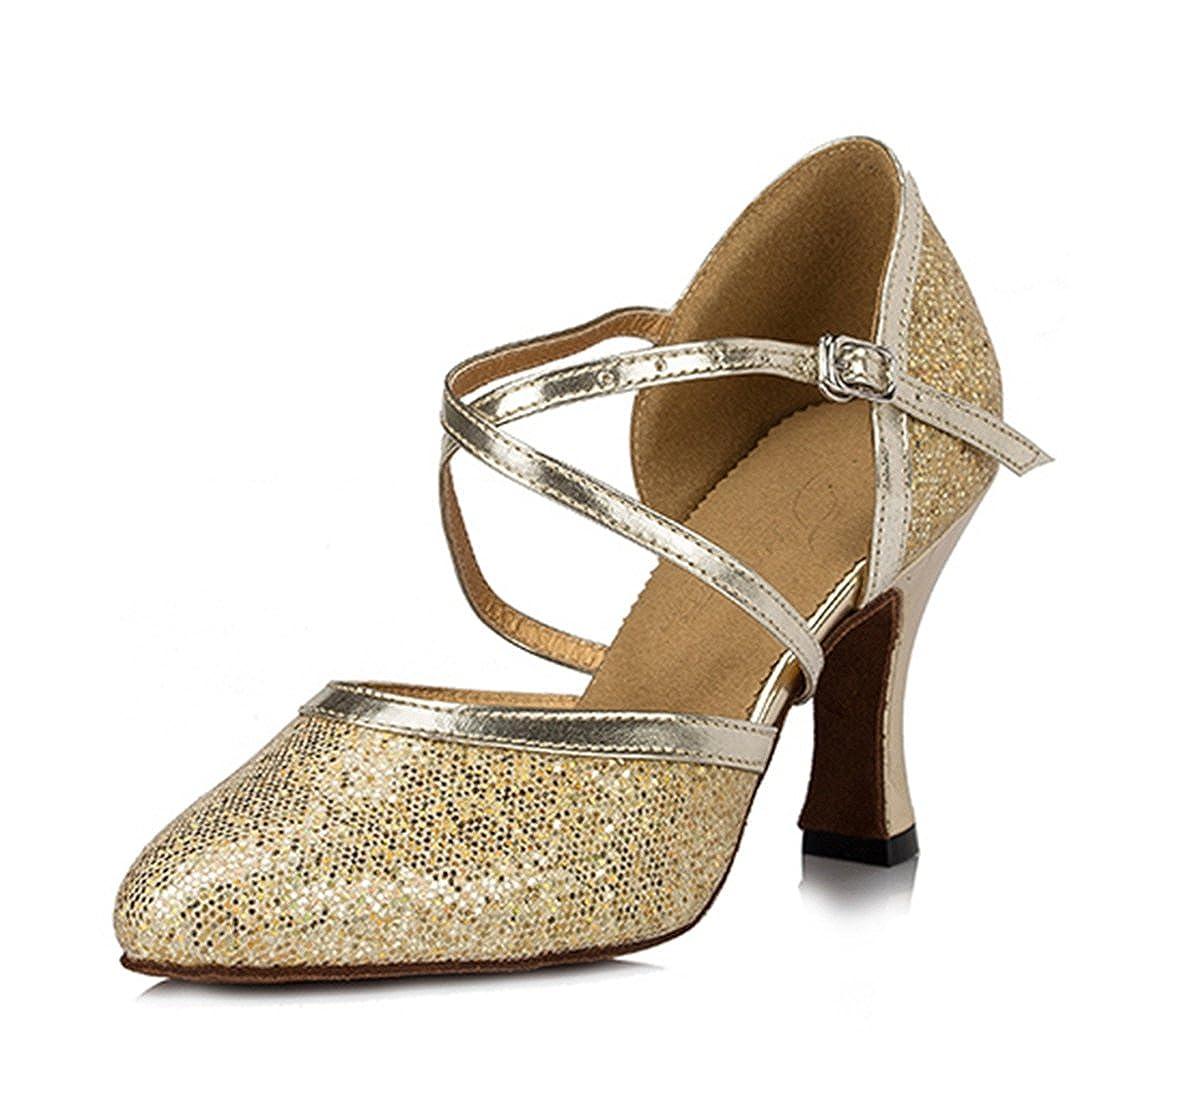 686038b621bab Miyoopark Women's Ankle Strap Glitter Buckle Synthetic Ballroom Salsa Latin  Dance Shoes